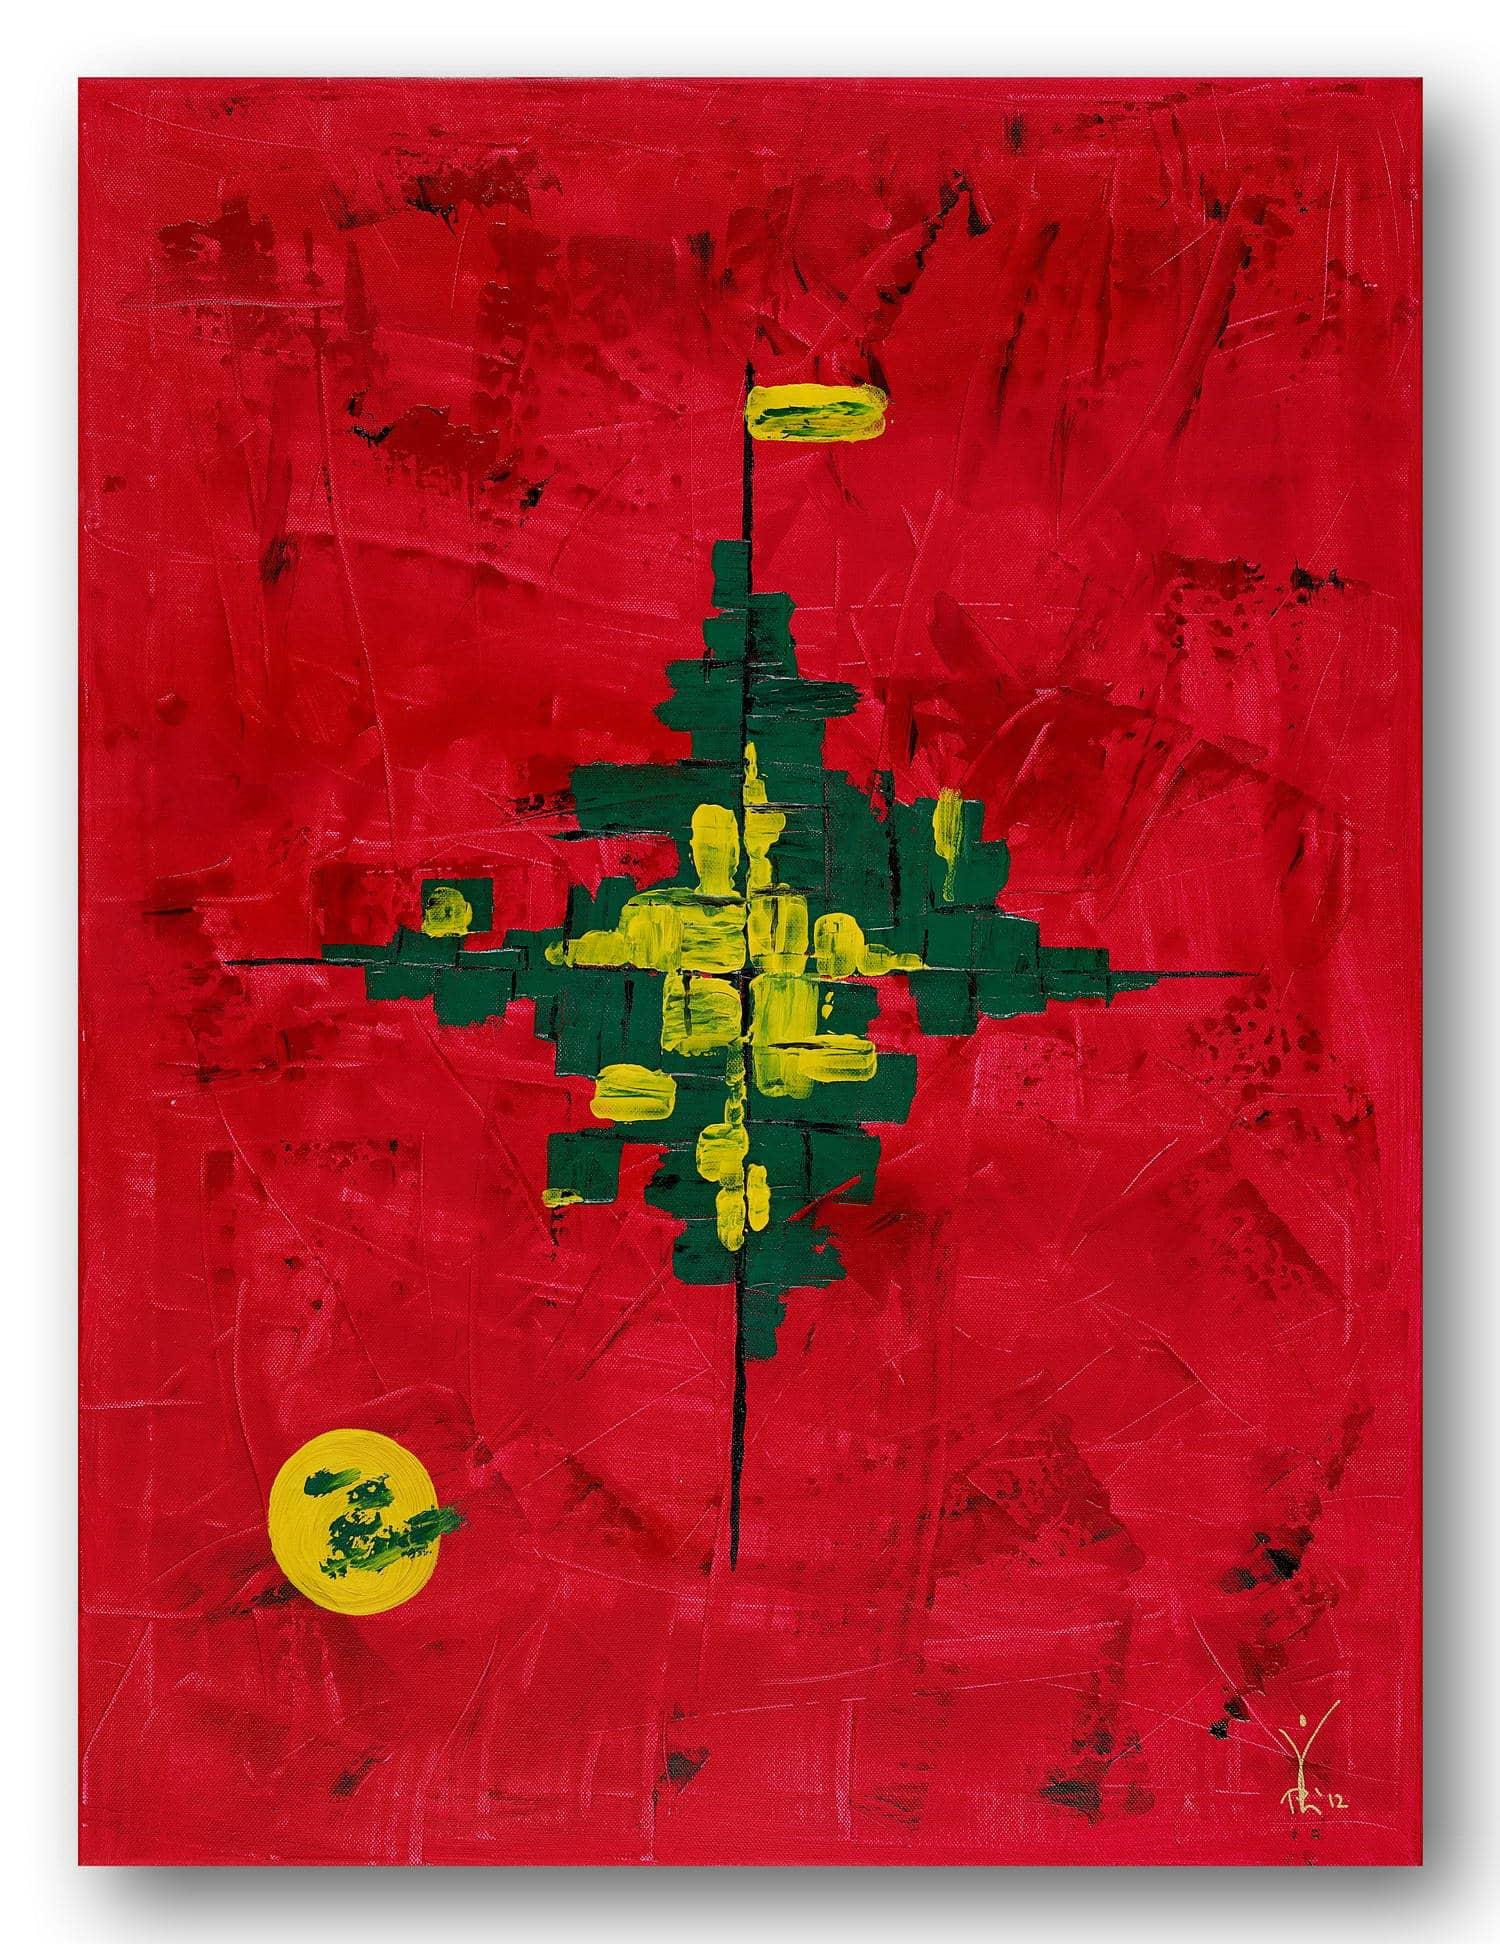 033_Polarnacht - Acrylic / Canvas 60 x 80 cm, 23.6 x 31.5 inch